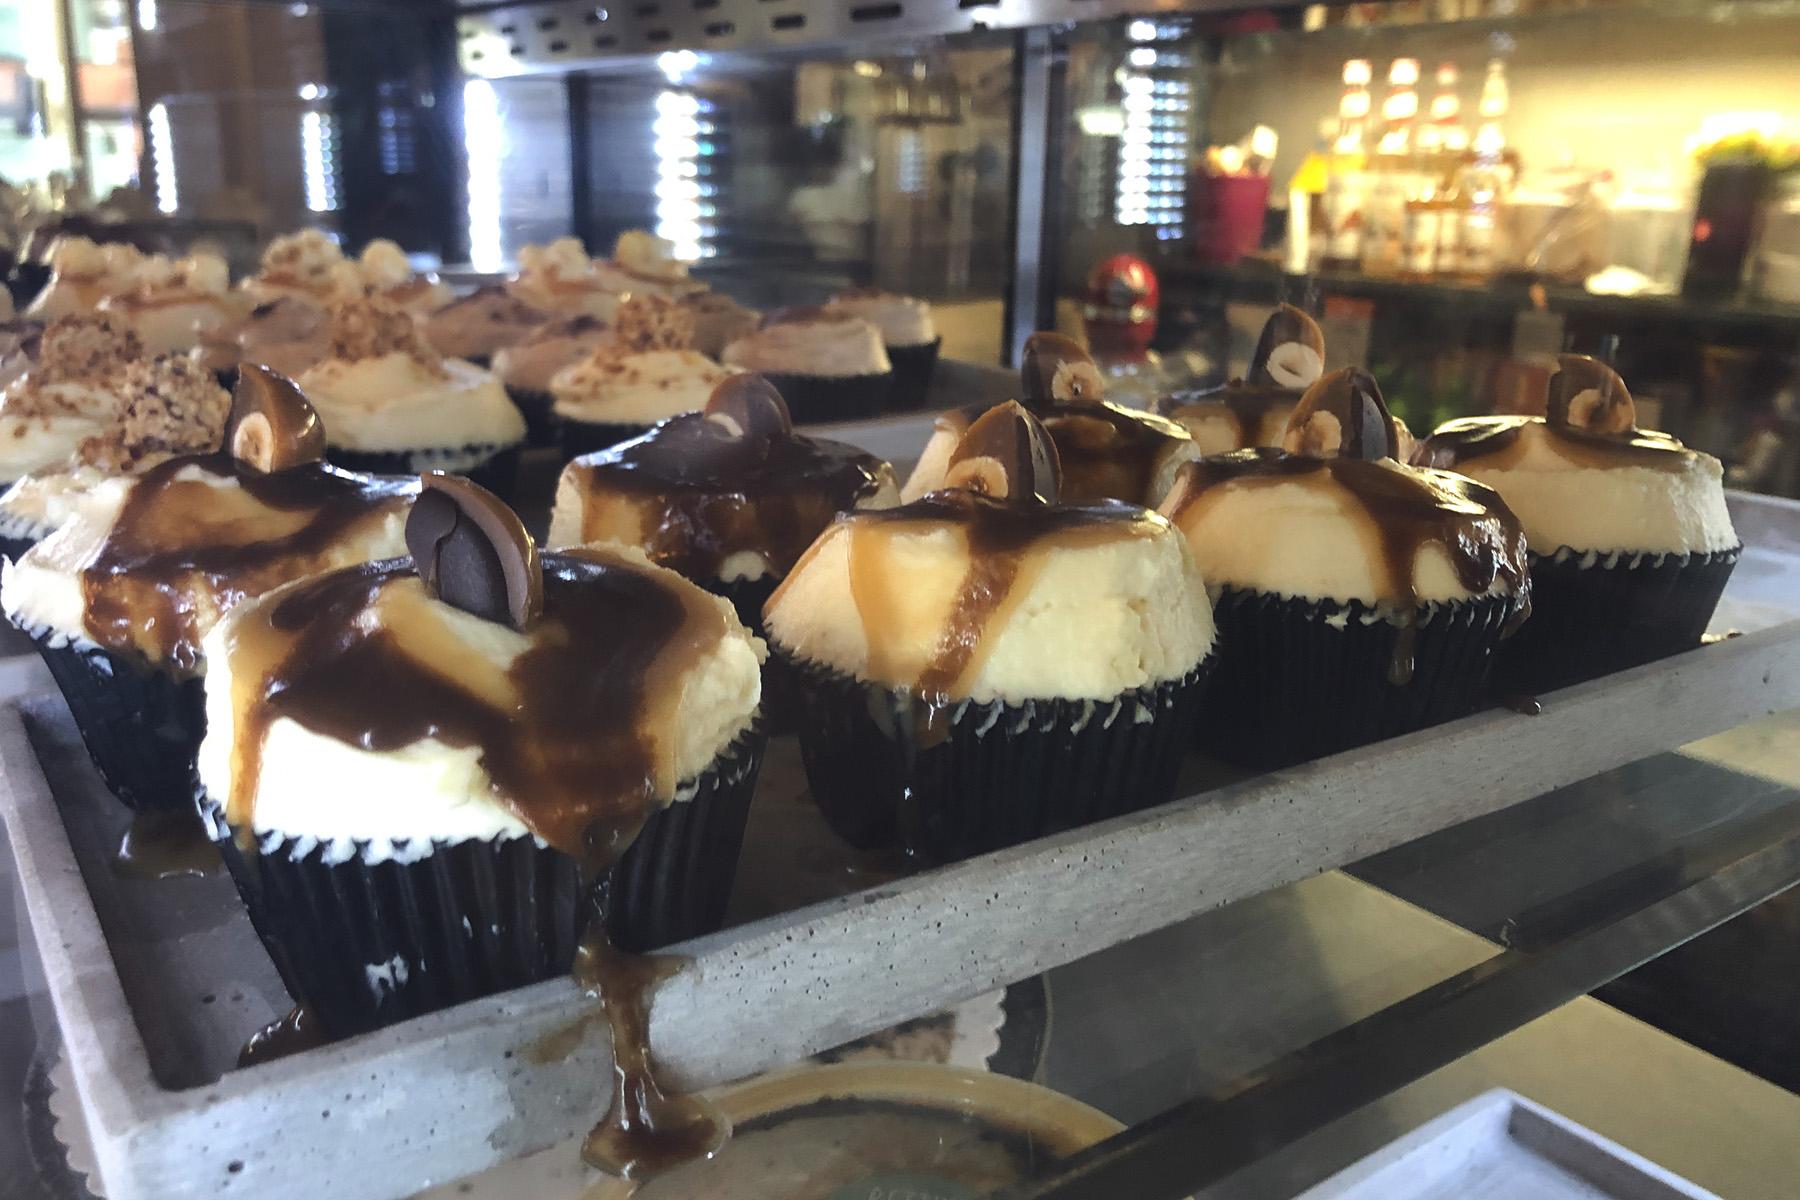 bettys bakery koeln 2 artikel – ©Sarah Kleiss